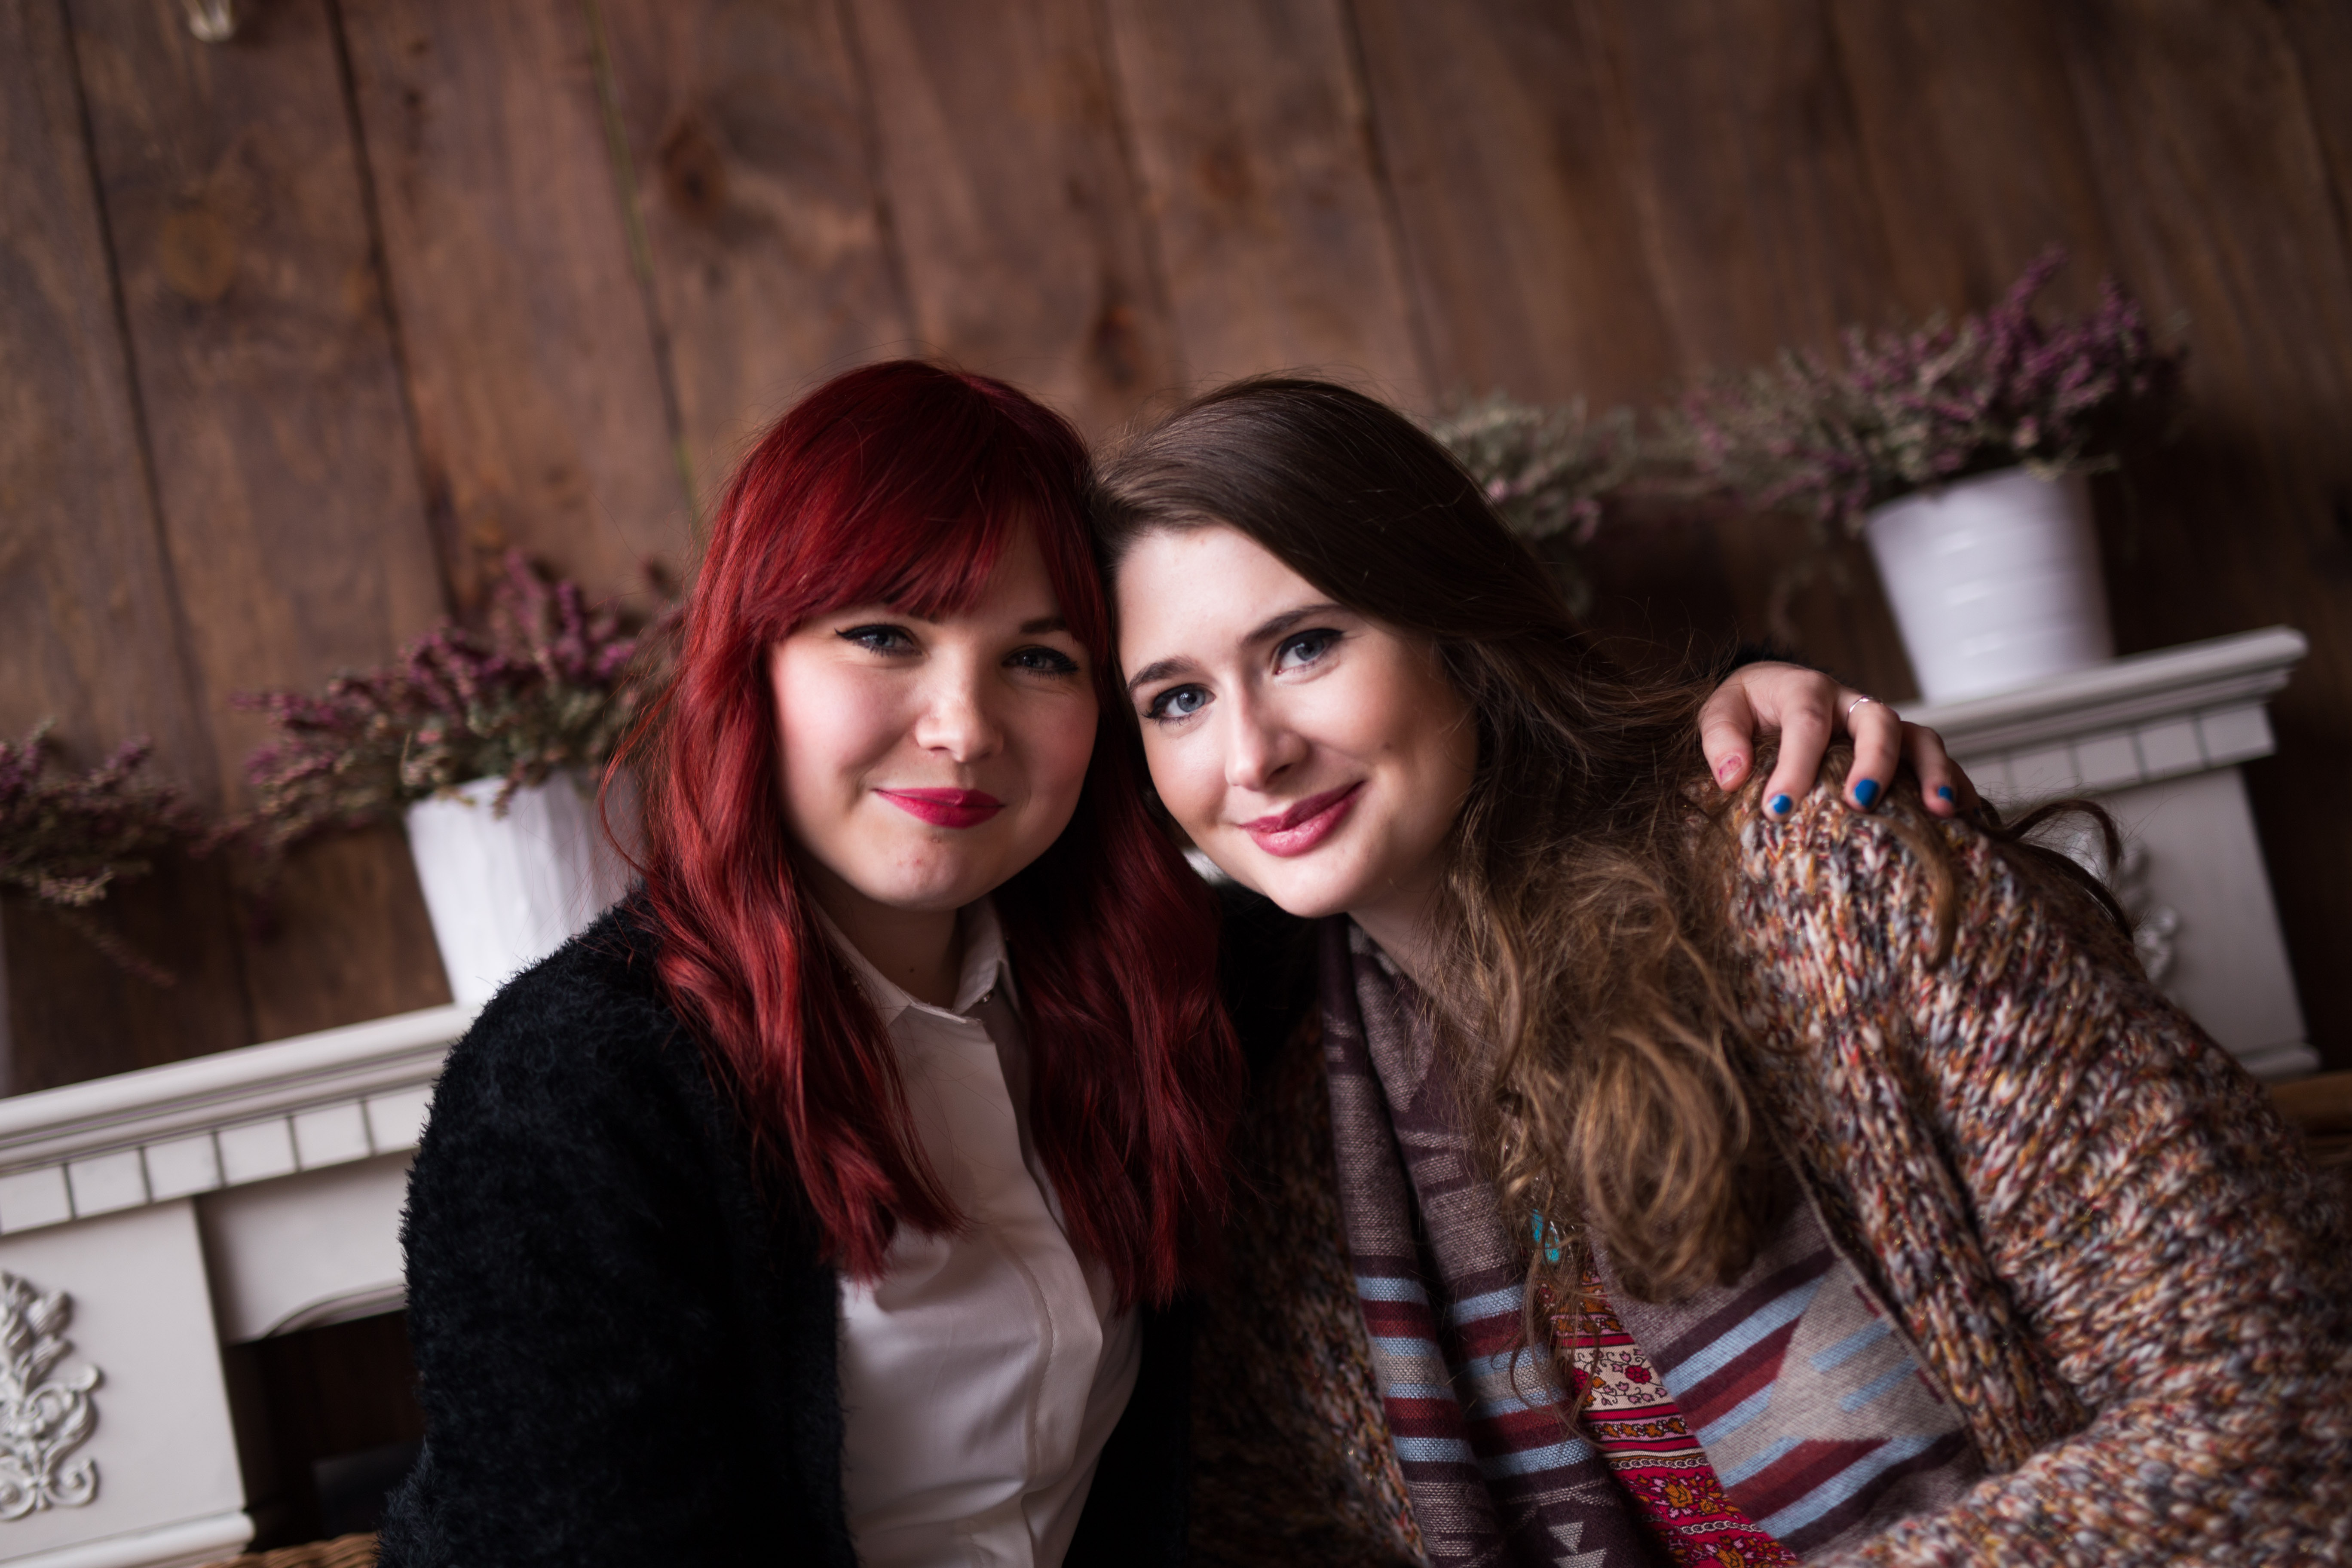 Paige Calvert & Adora Mehitabel, The Bloggers' Market